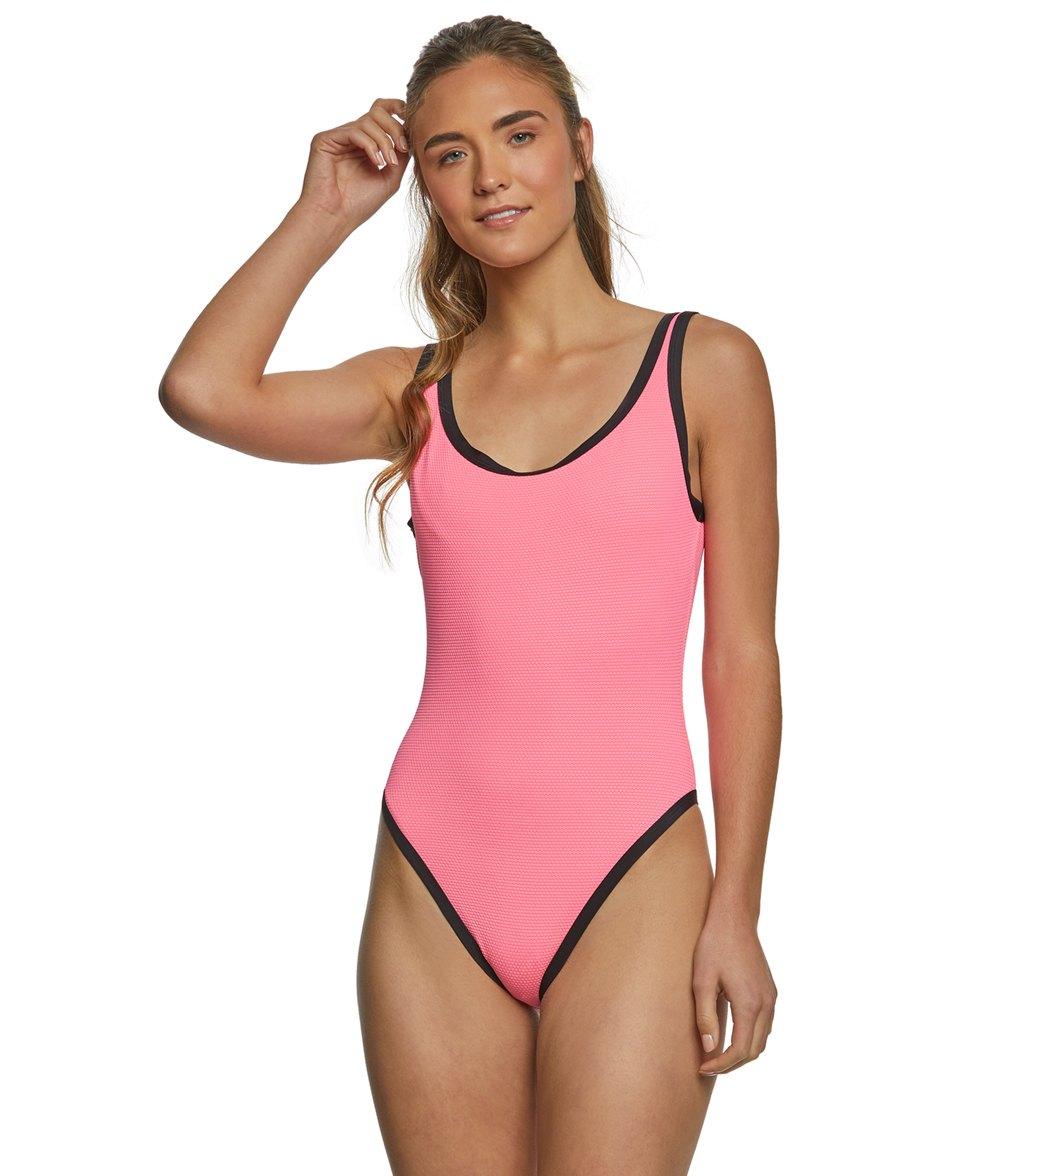 70f977c84b Eidon Culebra Jenny Tank One Piece Swimsuit at SwimOutlet.com - Free  Shipping